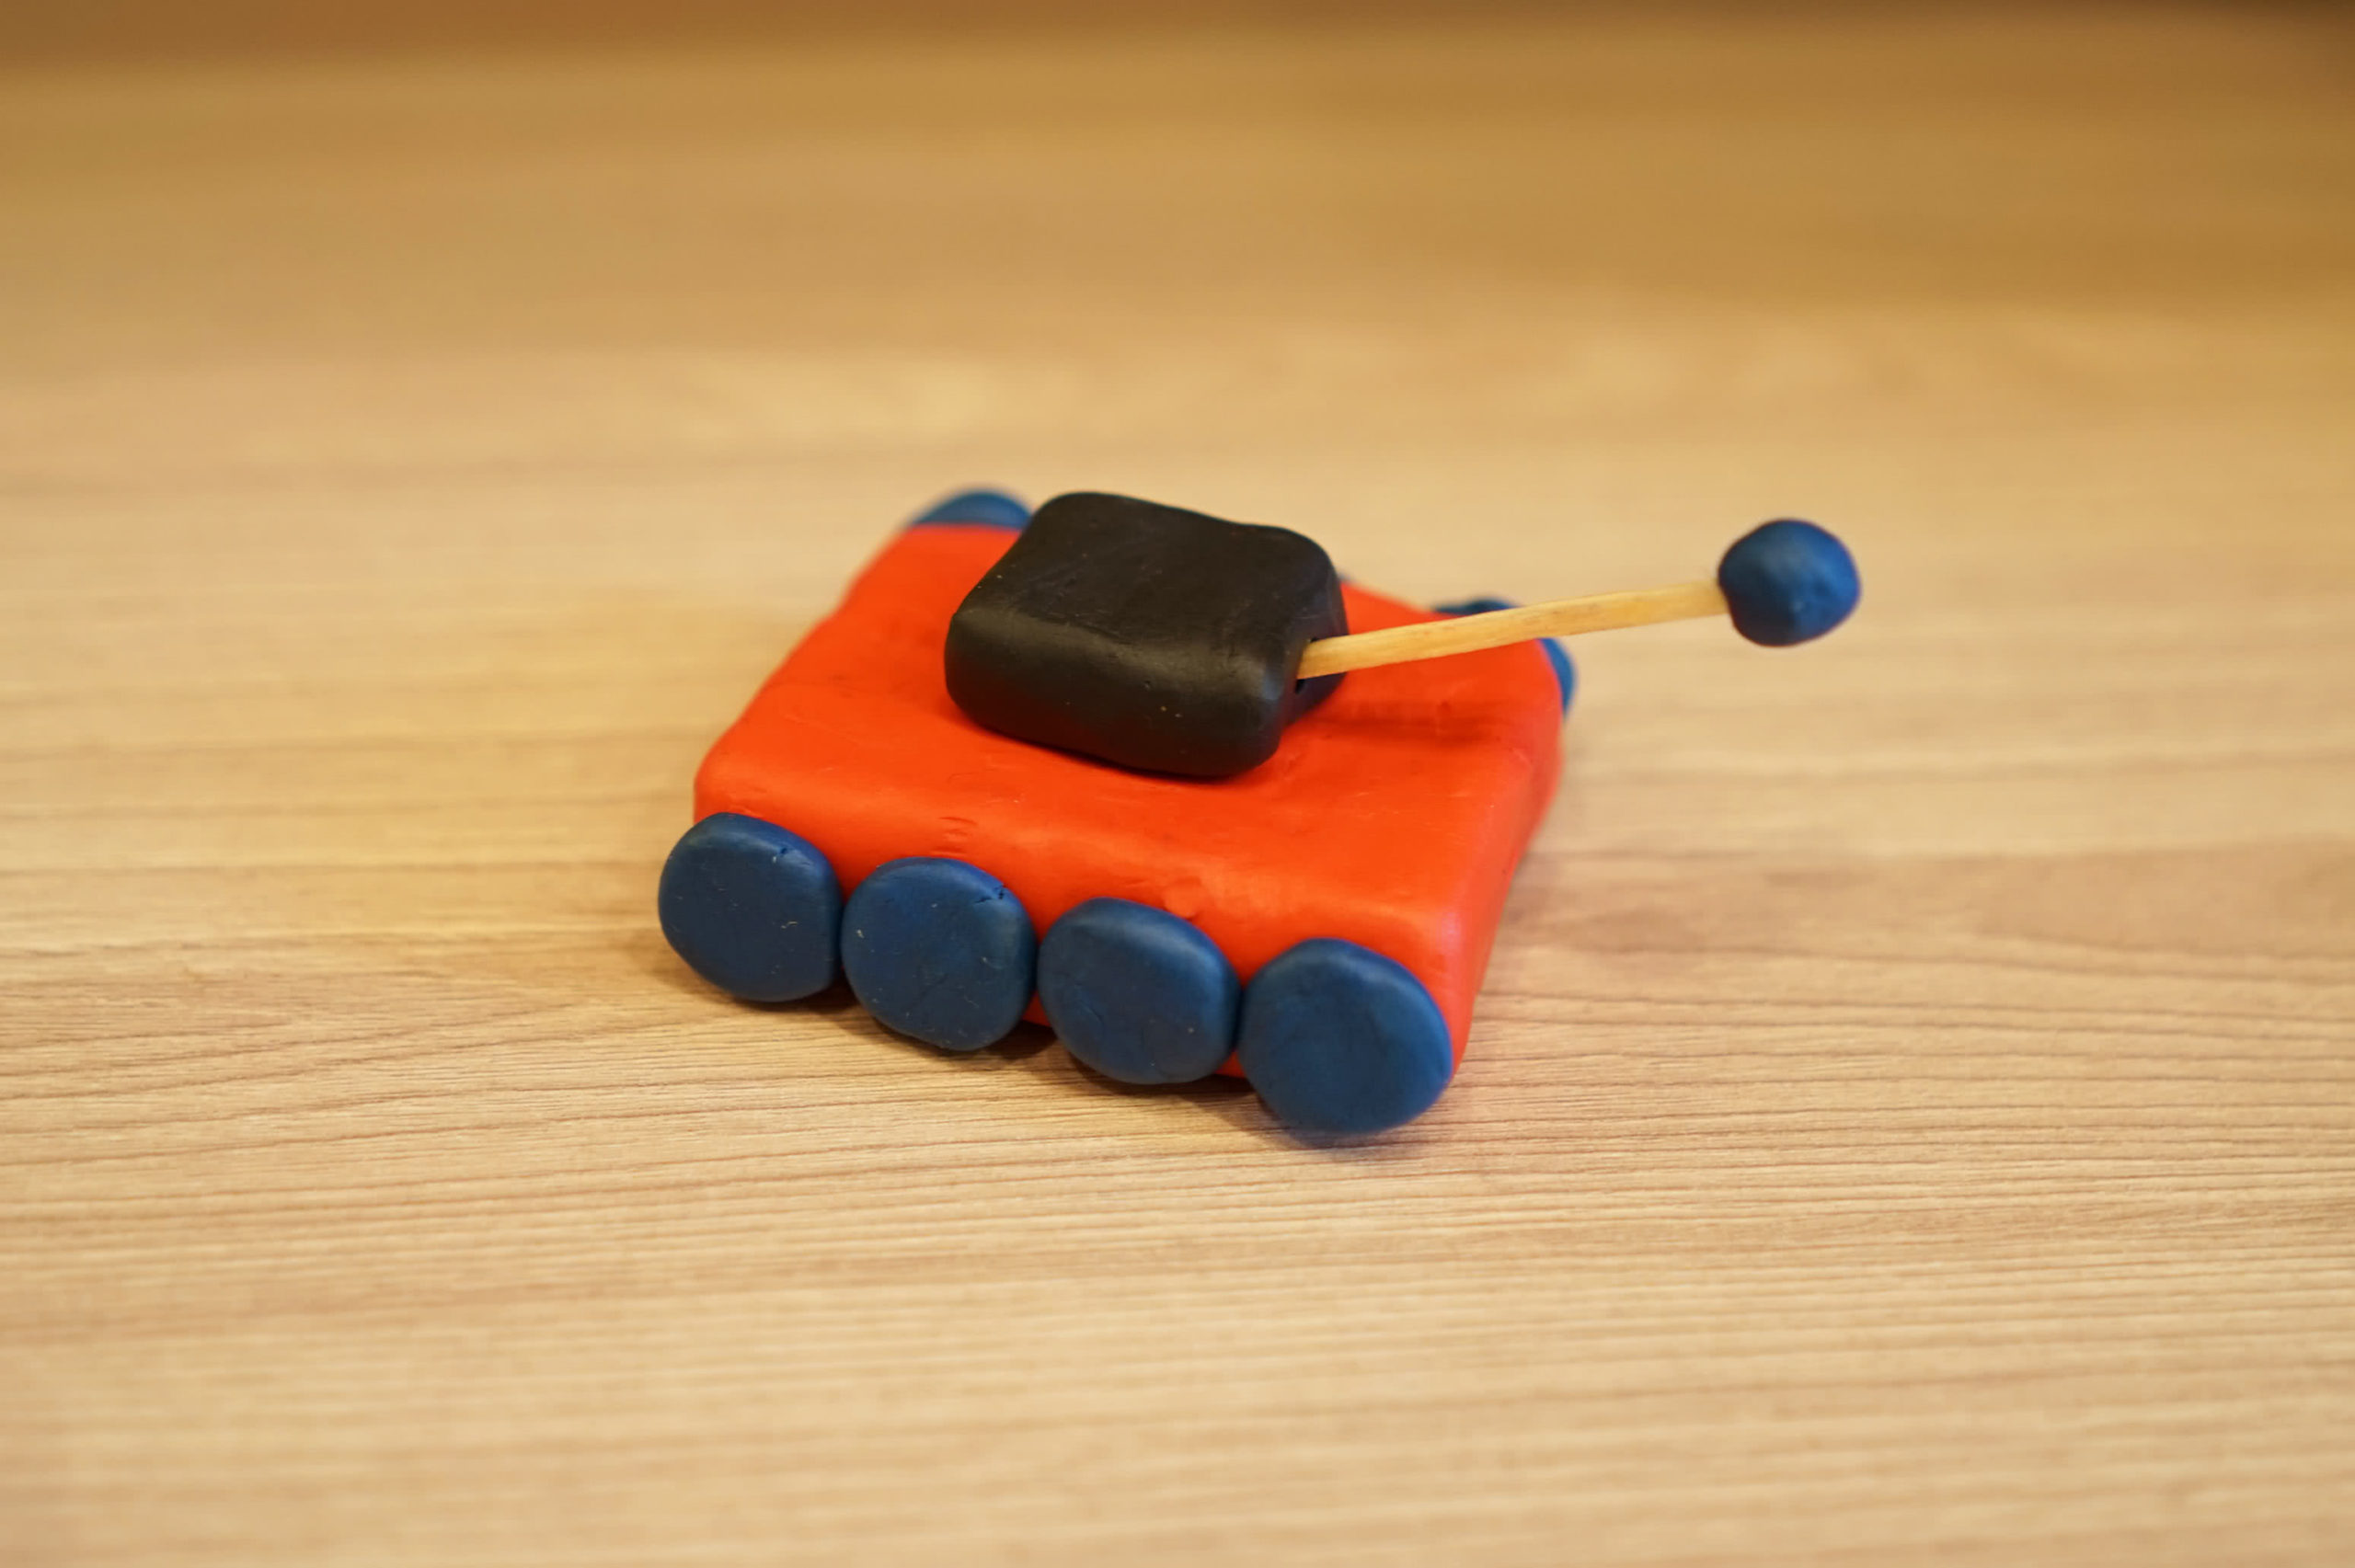 Машинка из пластилина своими руками картинка детям